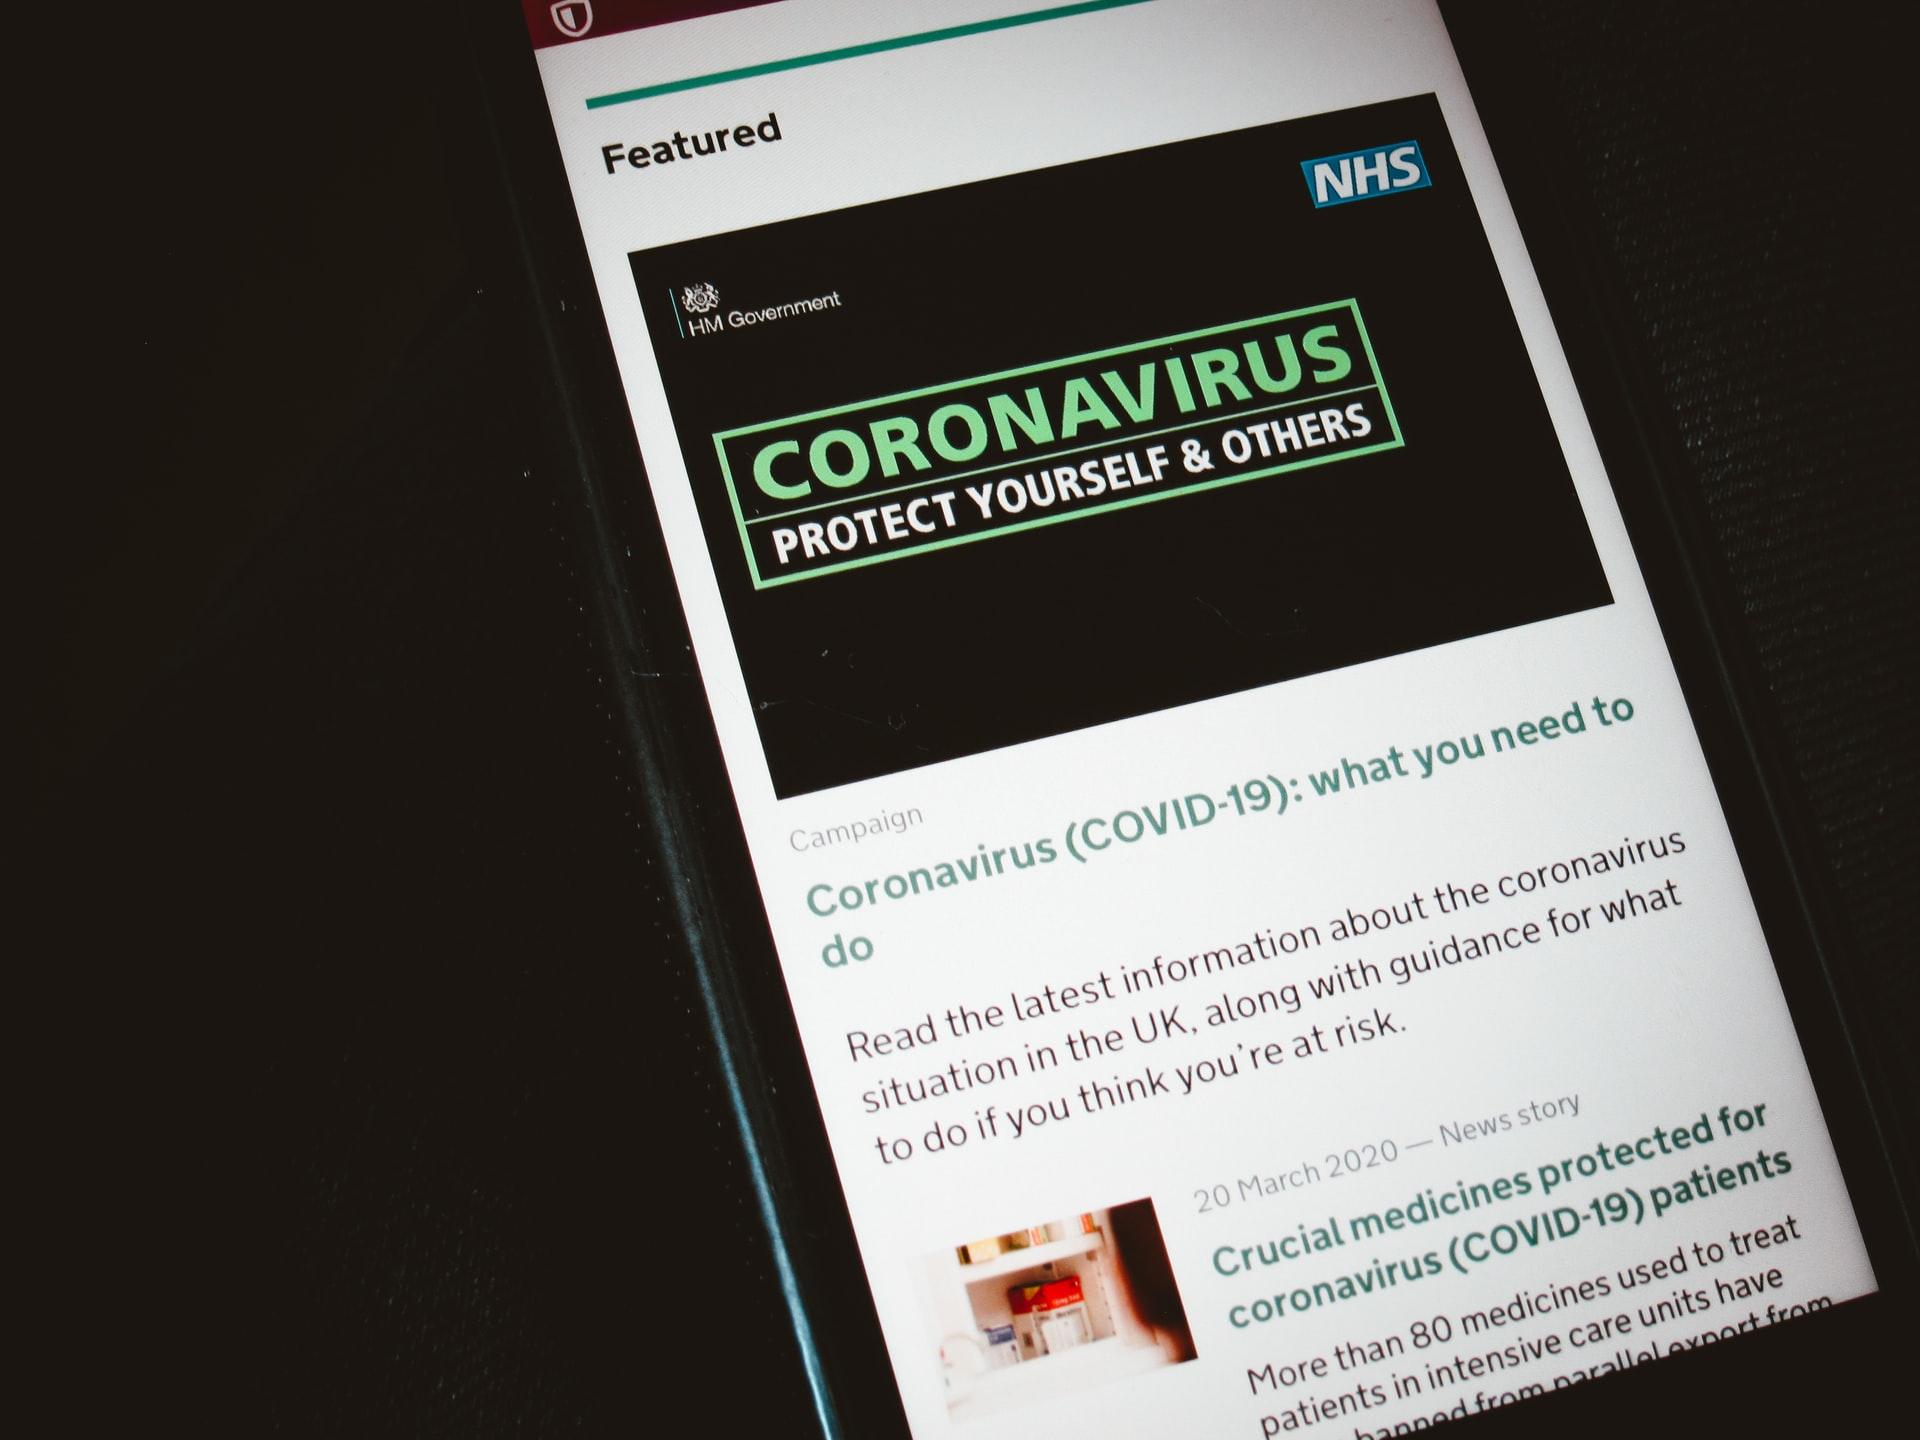 Werknemers testen op COVID-19 antistoffen?